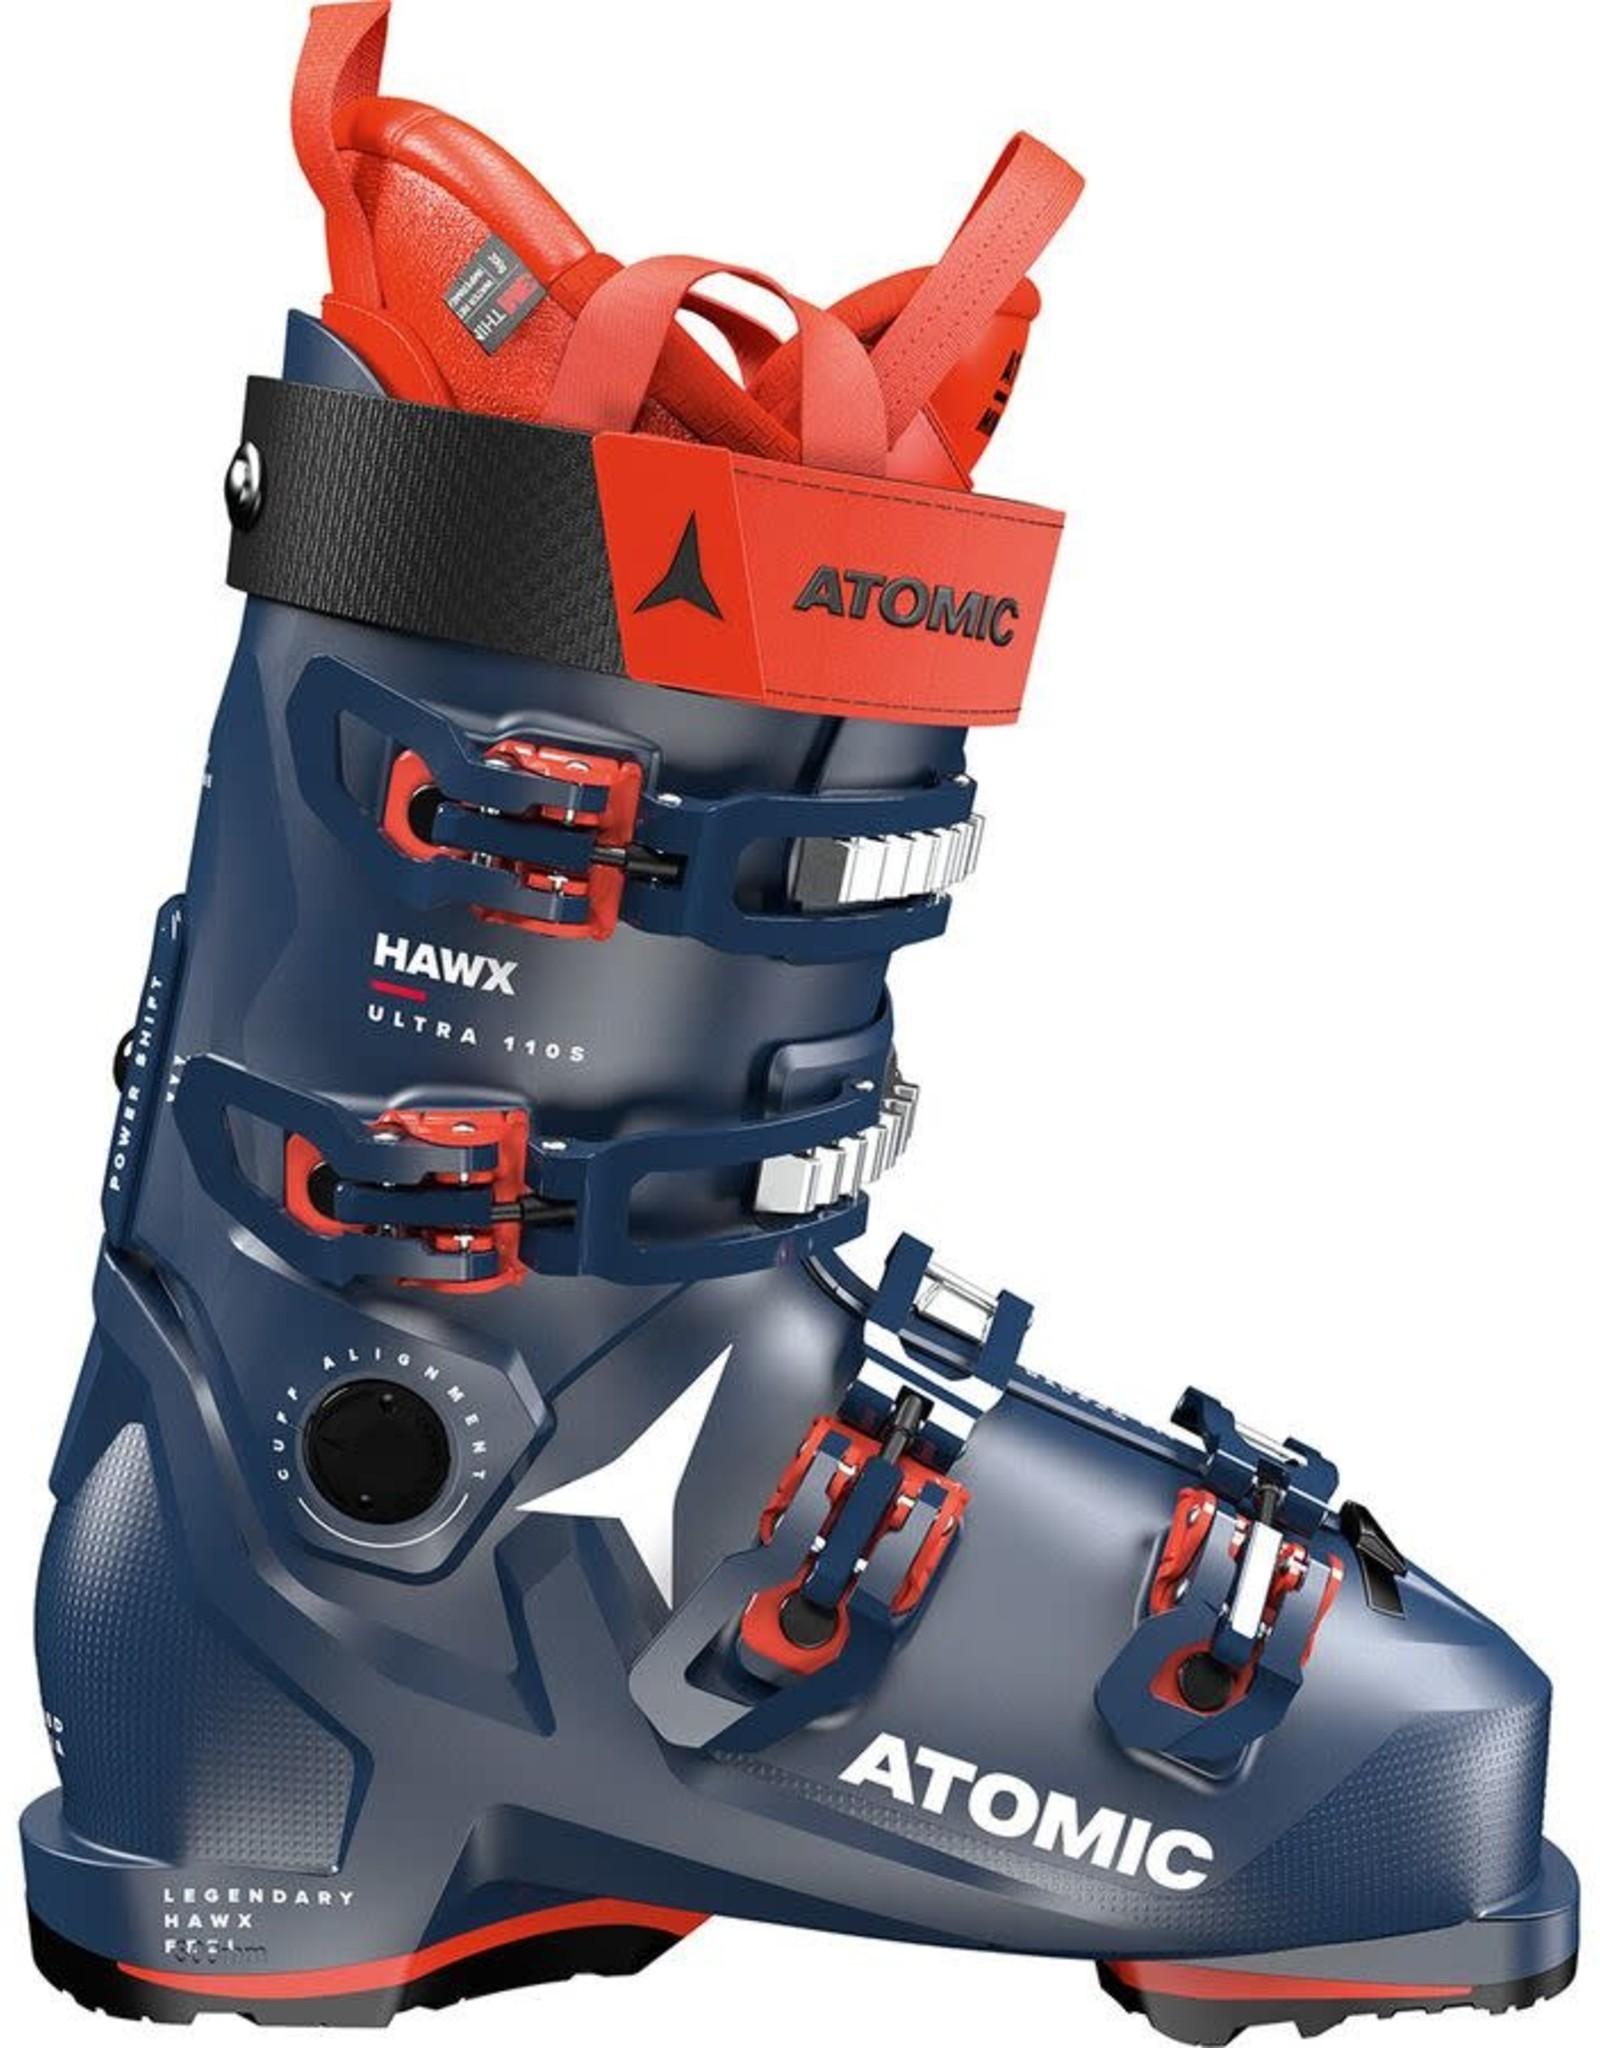 ATOMIC ATOMIC Ski Boots HAWX ULTRA 110 S (21/22)